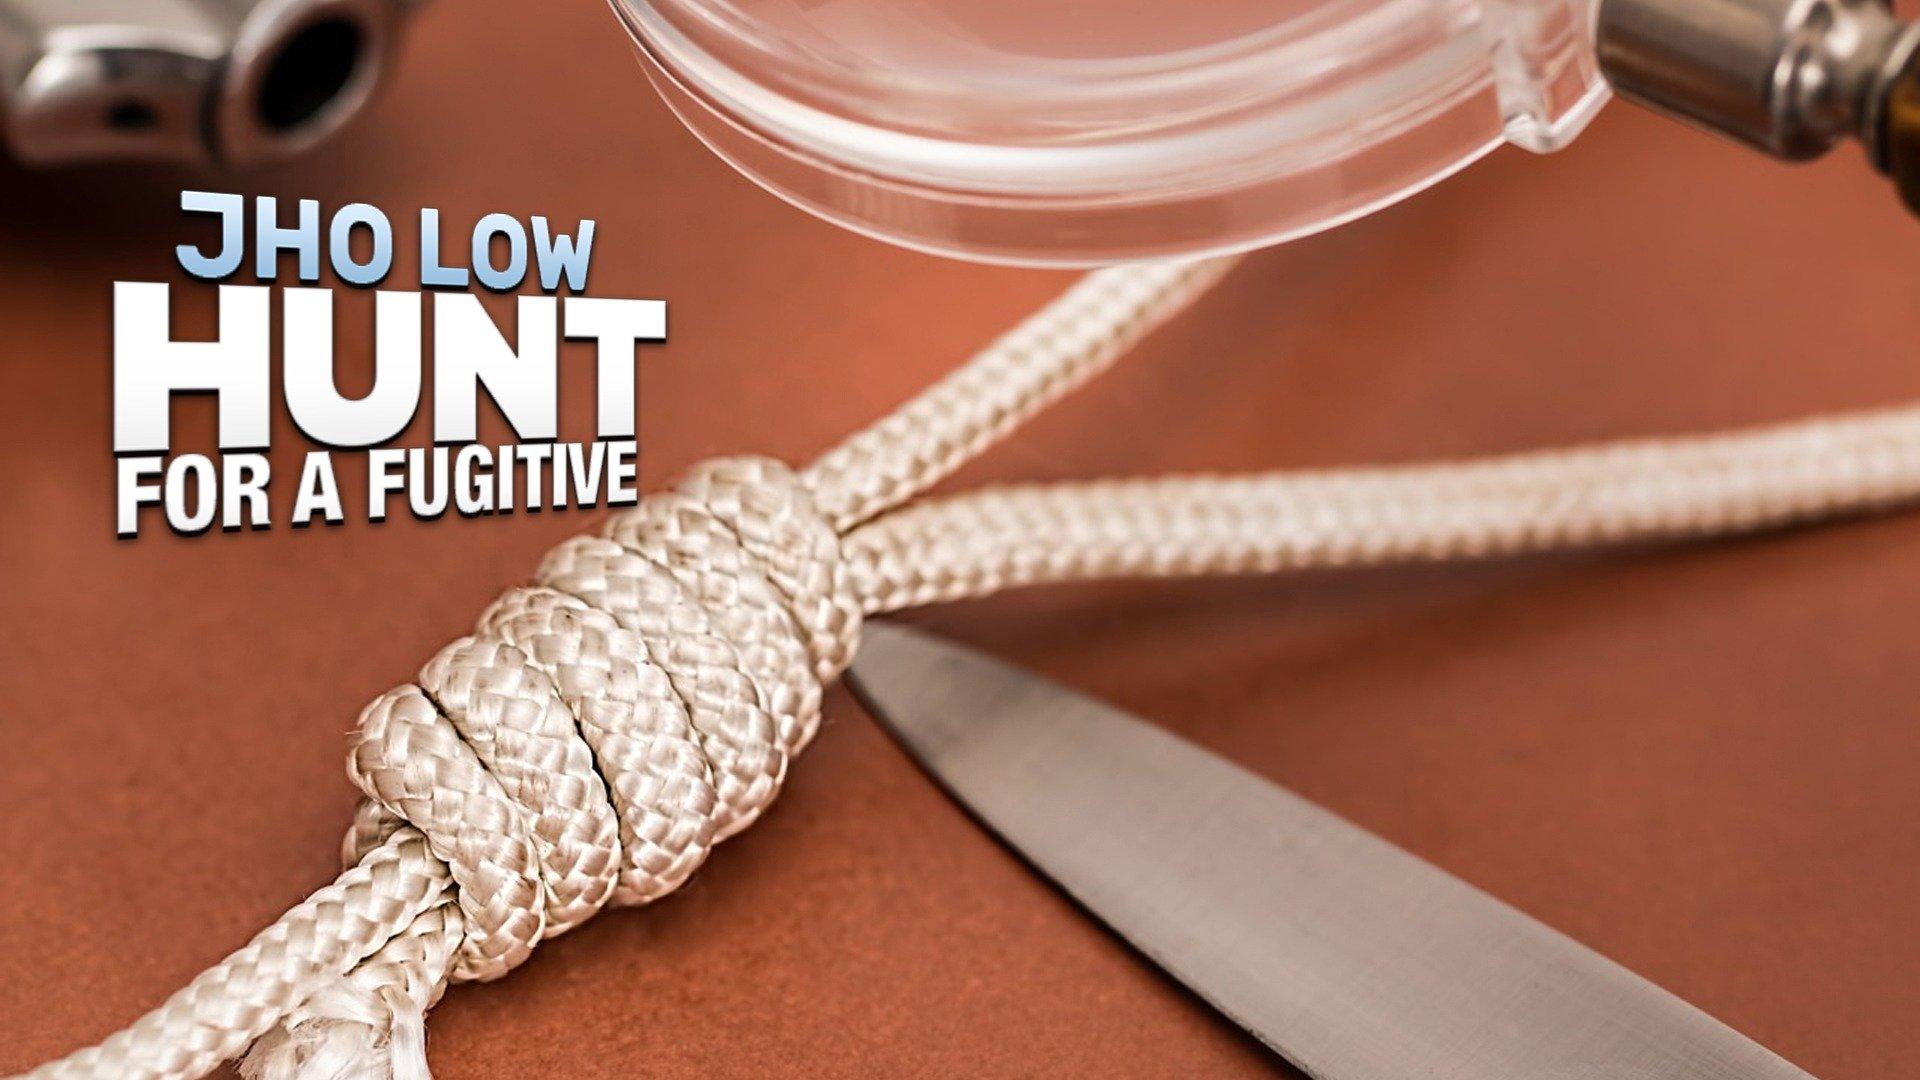 Jho Low - Hunt for a Fugitive